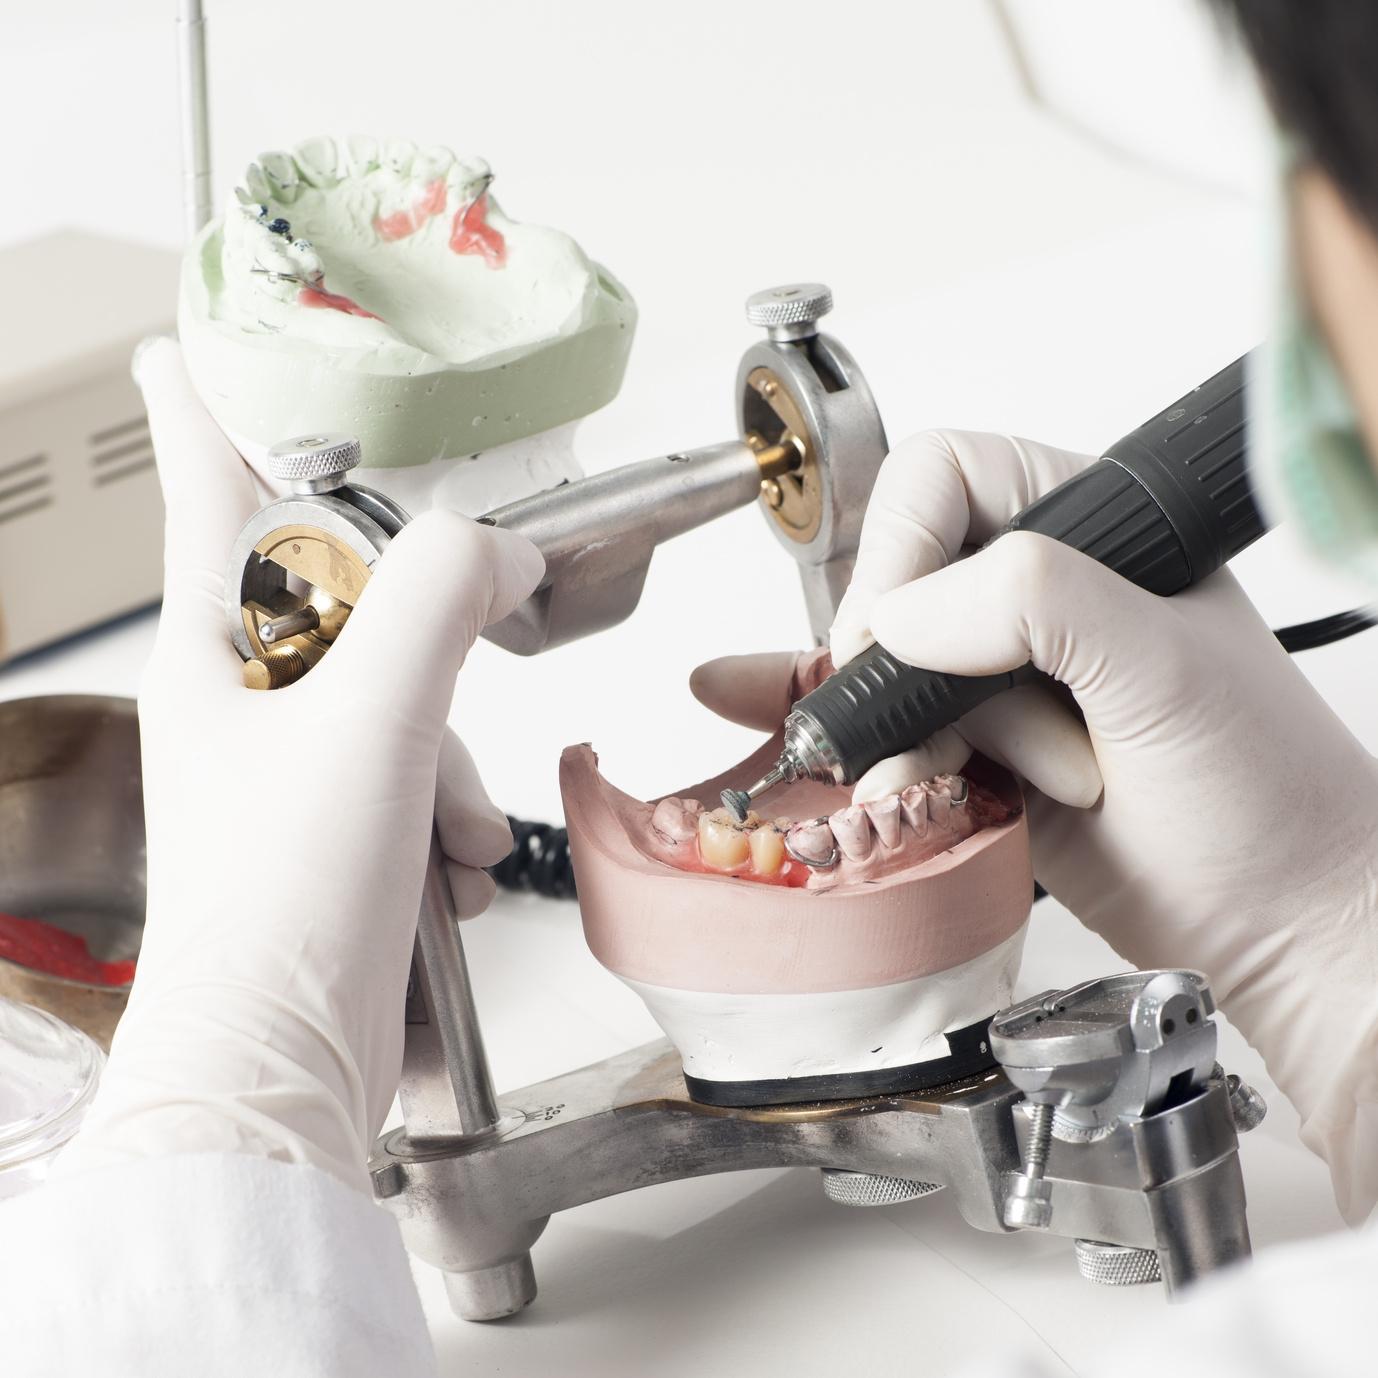 работа зубного техника